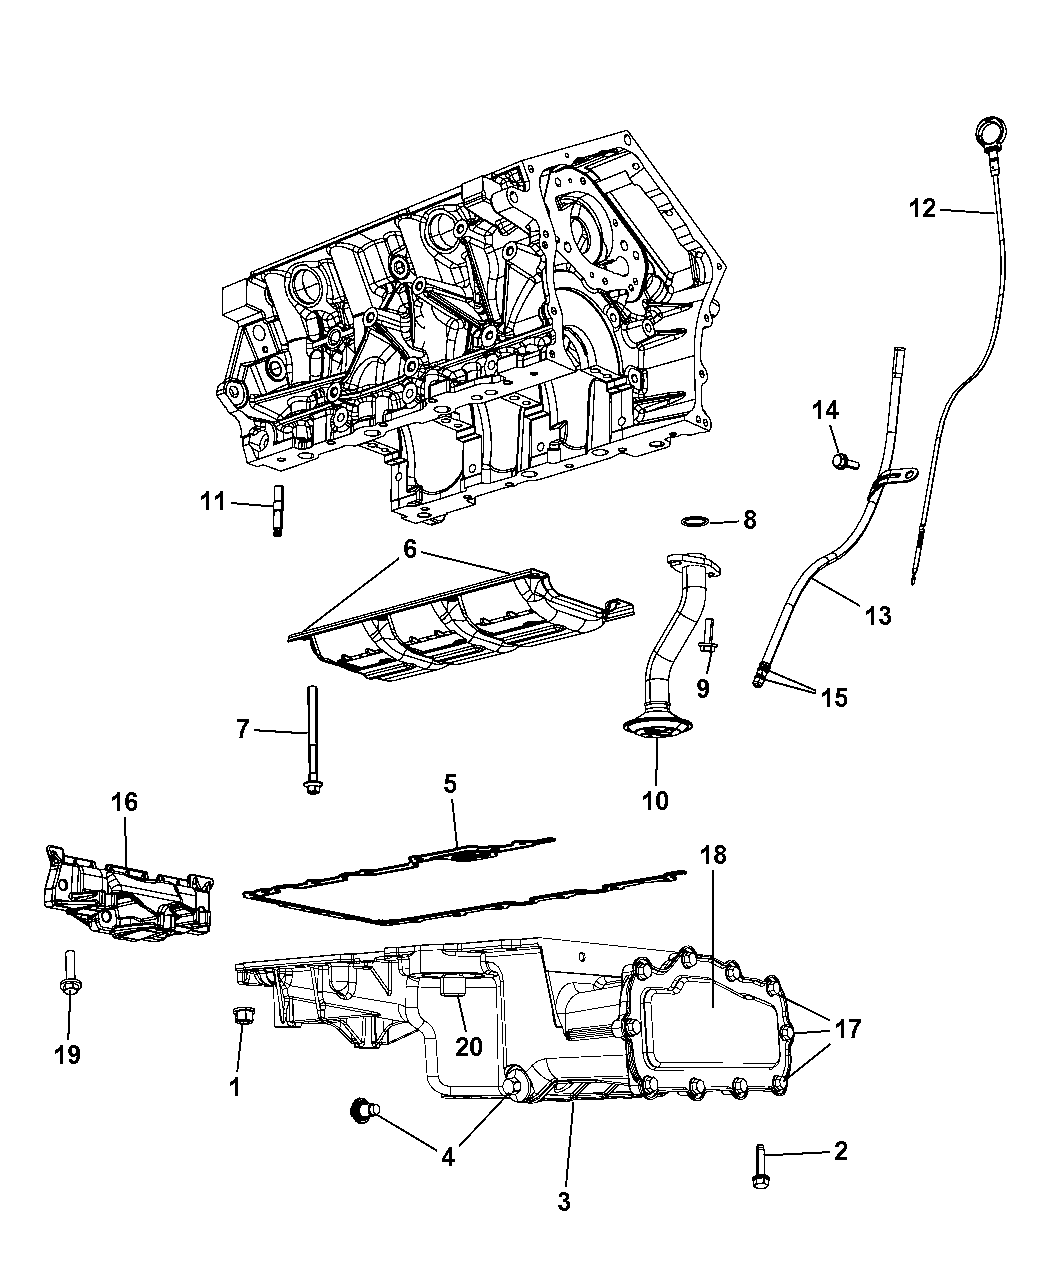 2009 Dodge Avenger Engine Oil Pan Level Indicator Diagram Related Parts Thumbnail